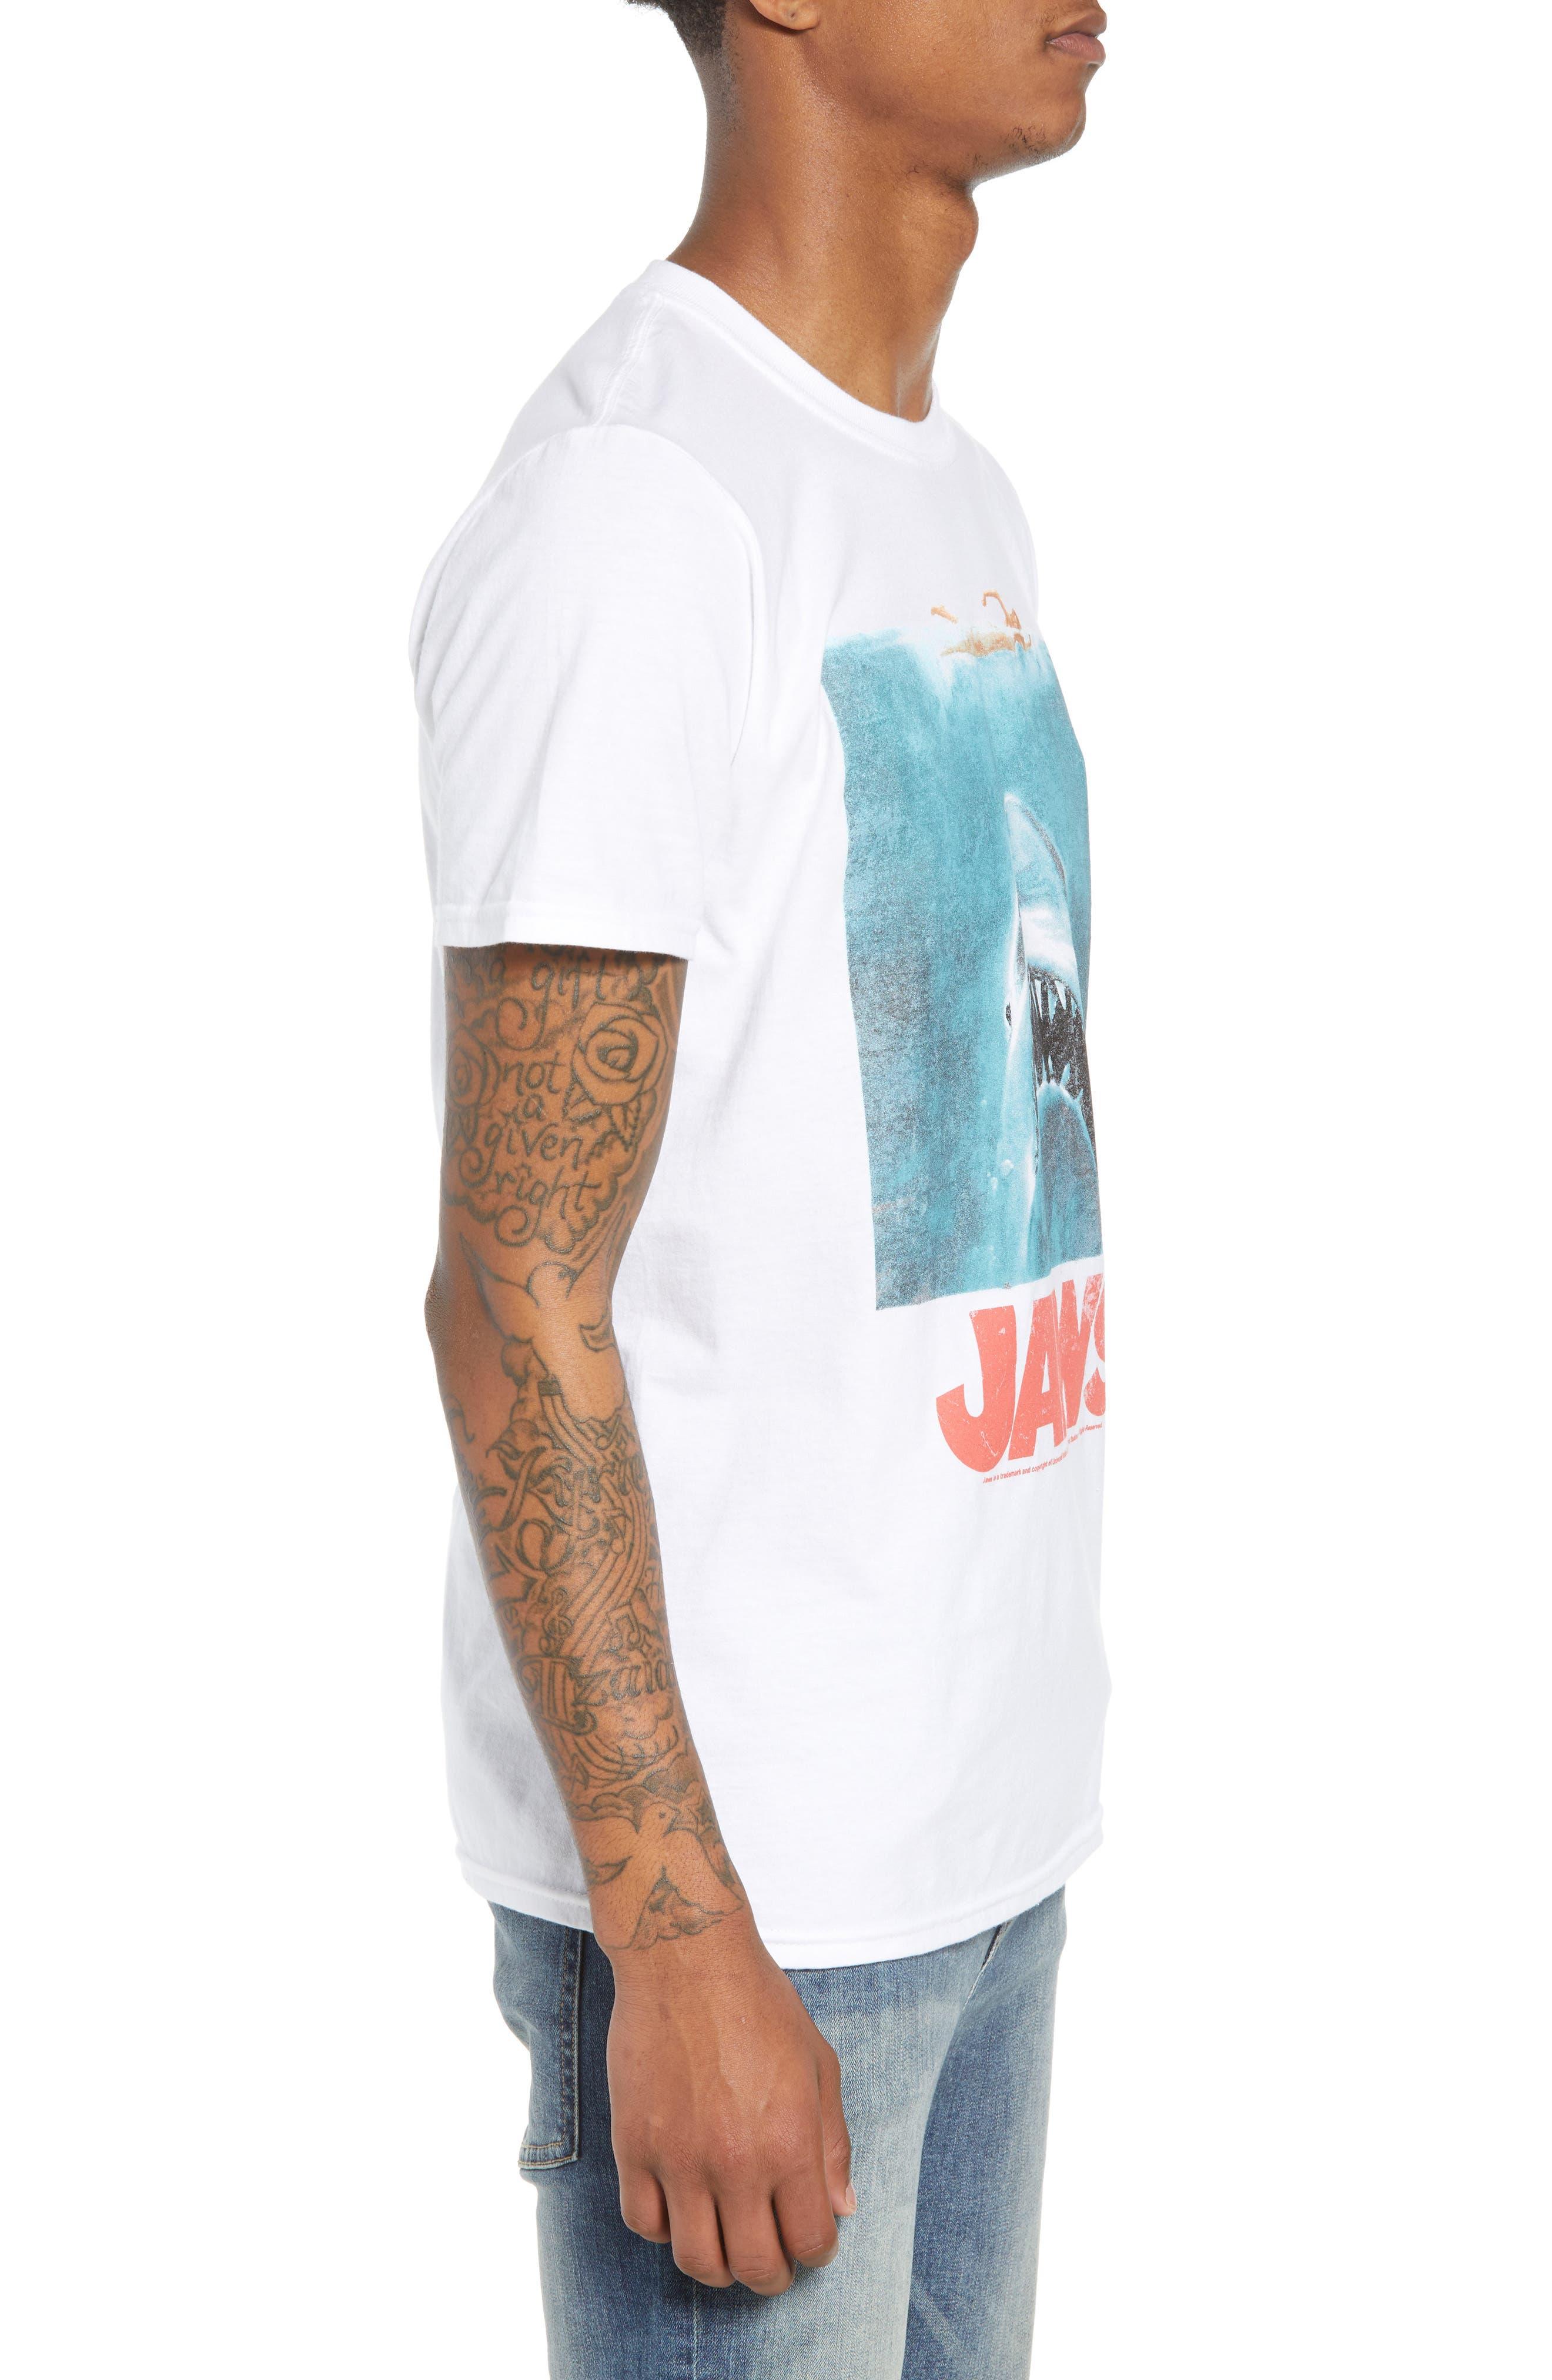 Jaws T-Shirt,                             Alternate thumbnail 2, color,                             White Jaws